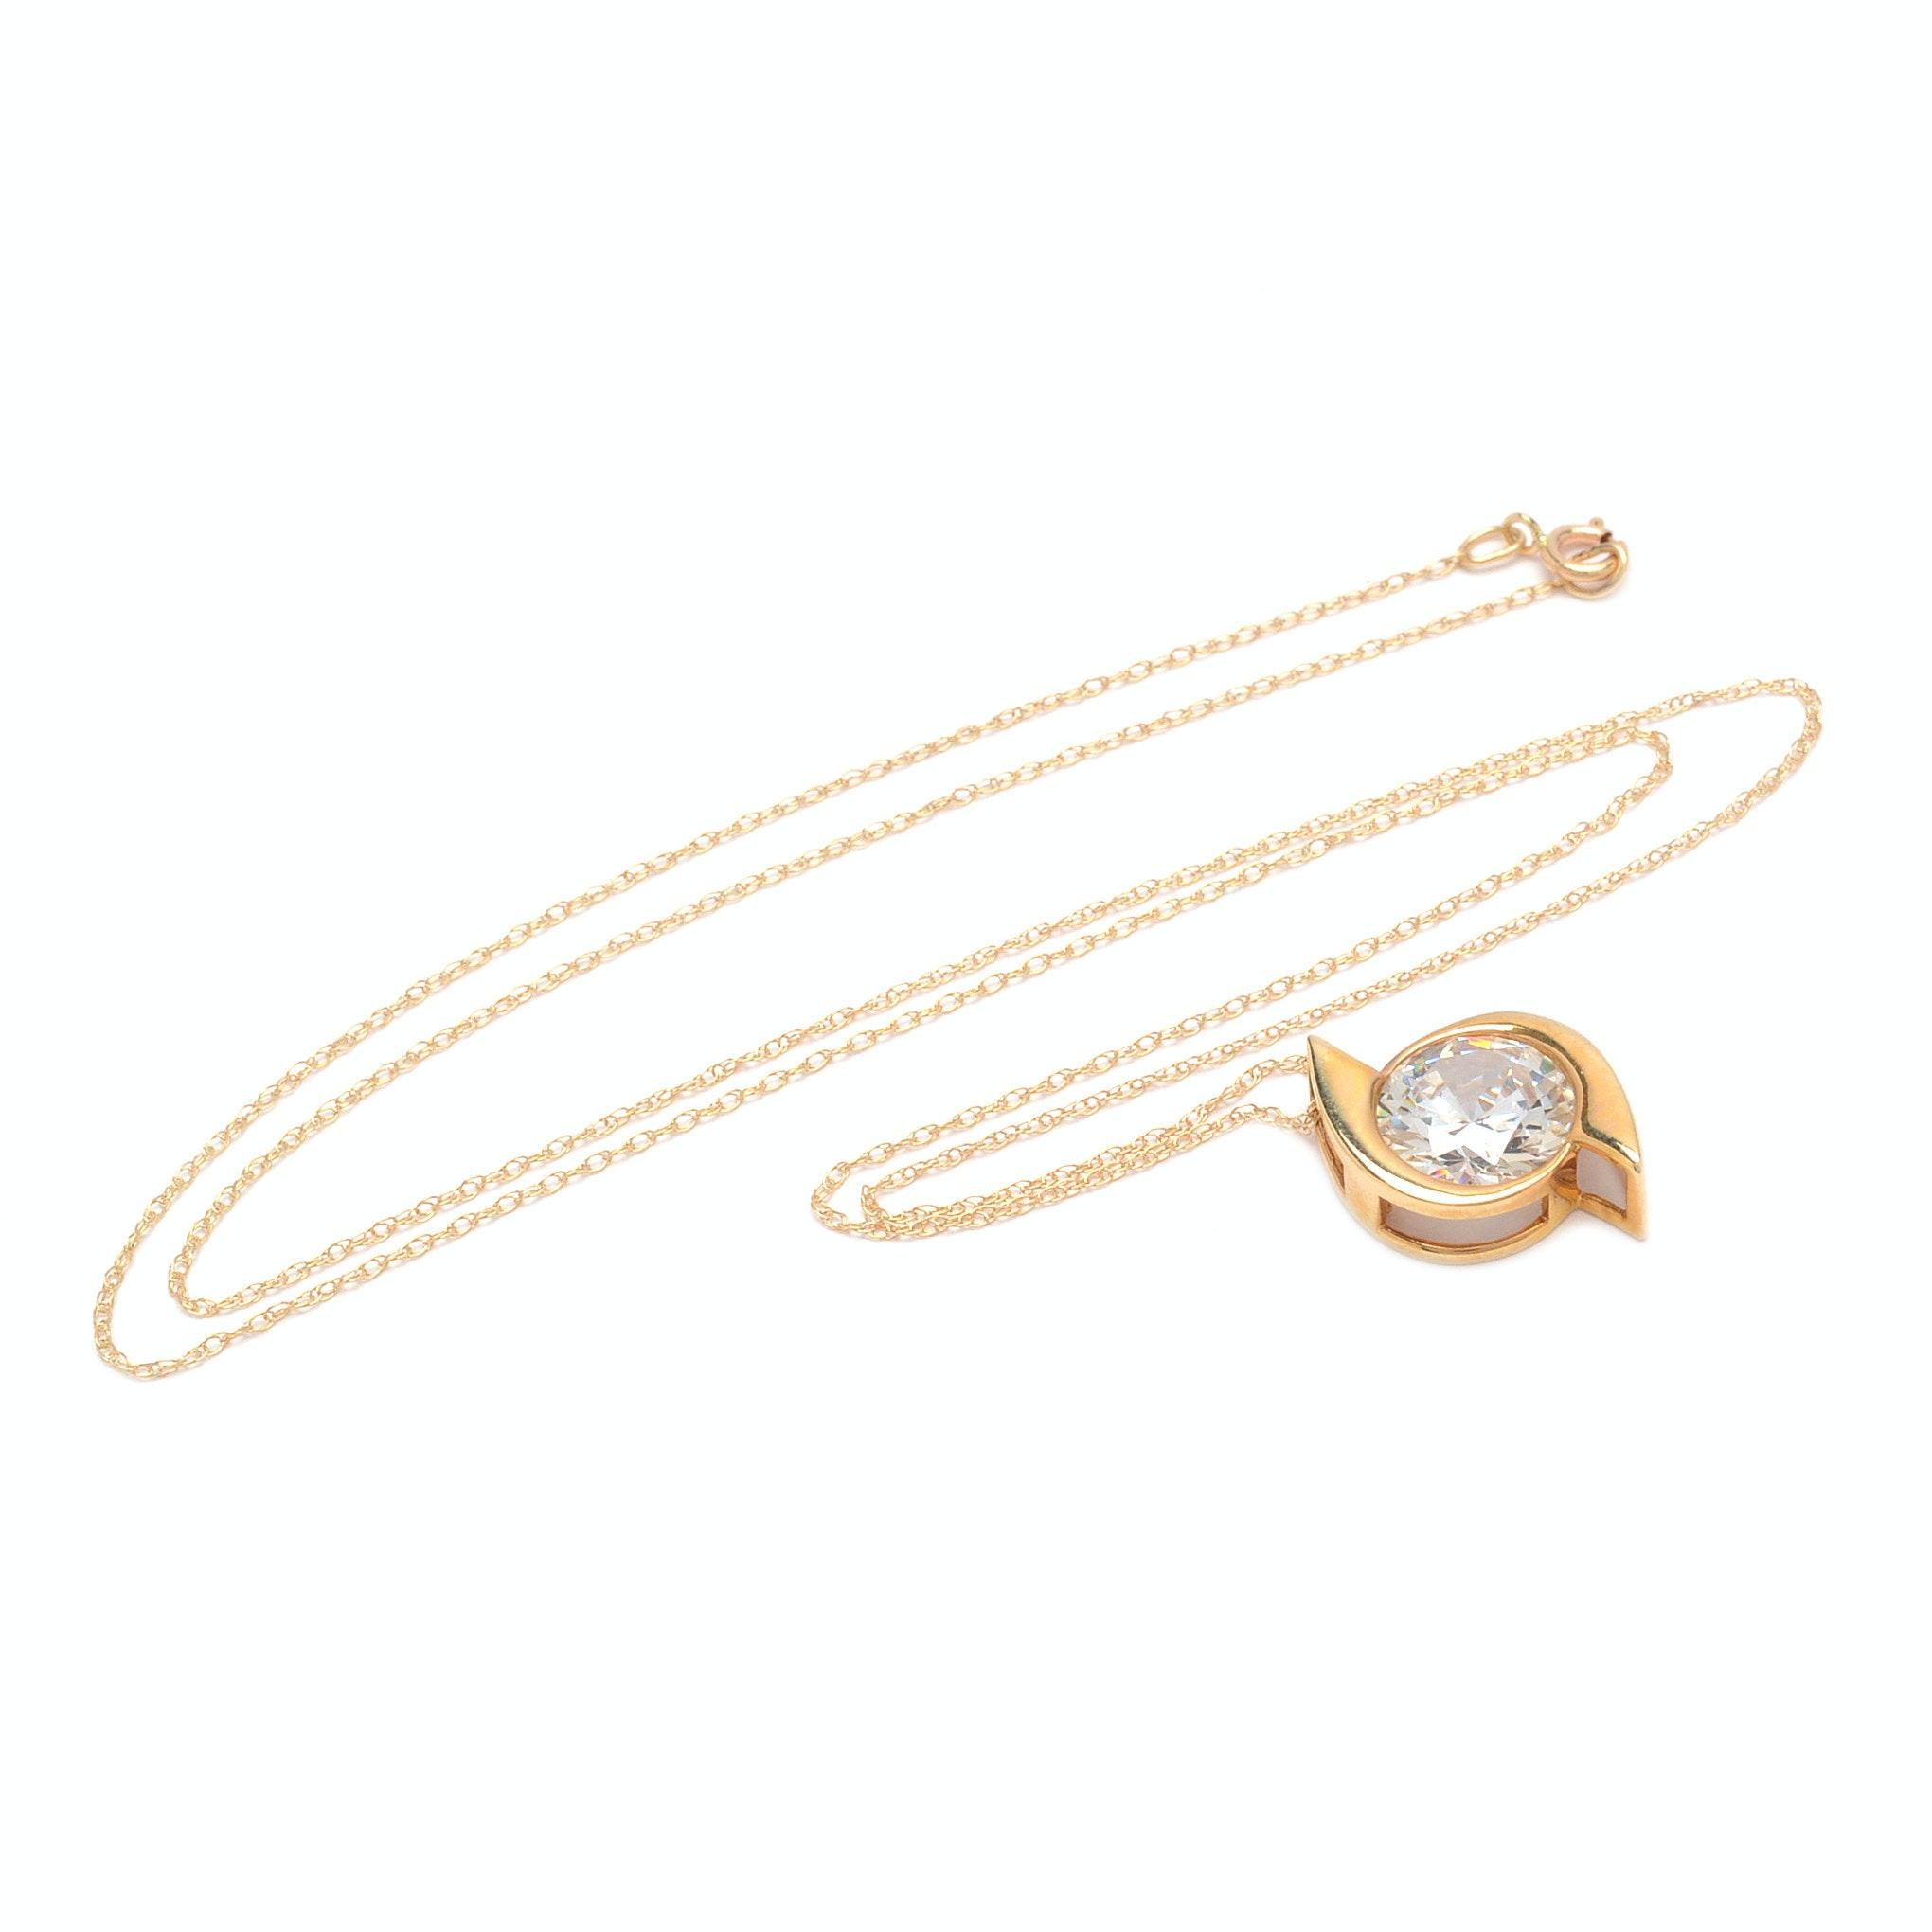 14K Yellow Gold Cubic Zirconia Pendant Necklace